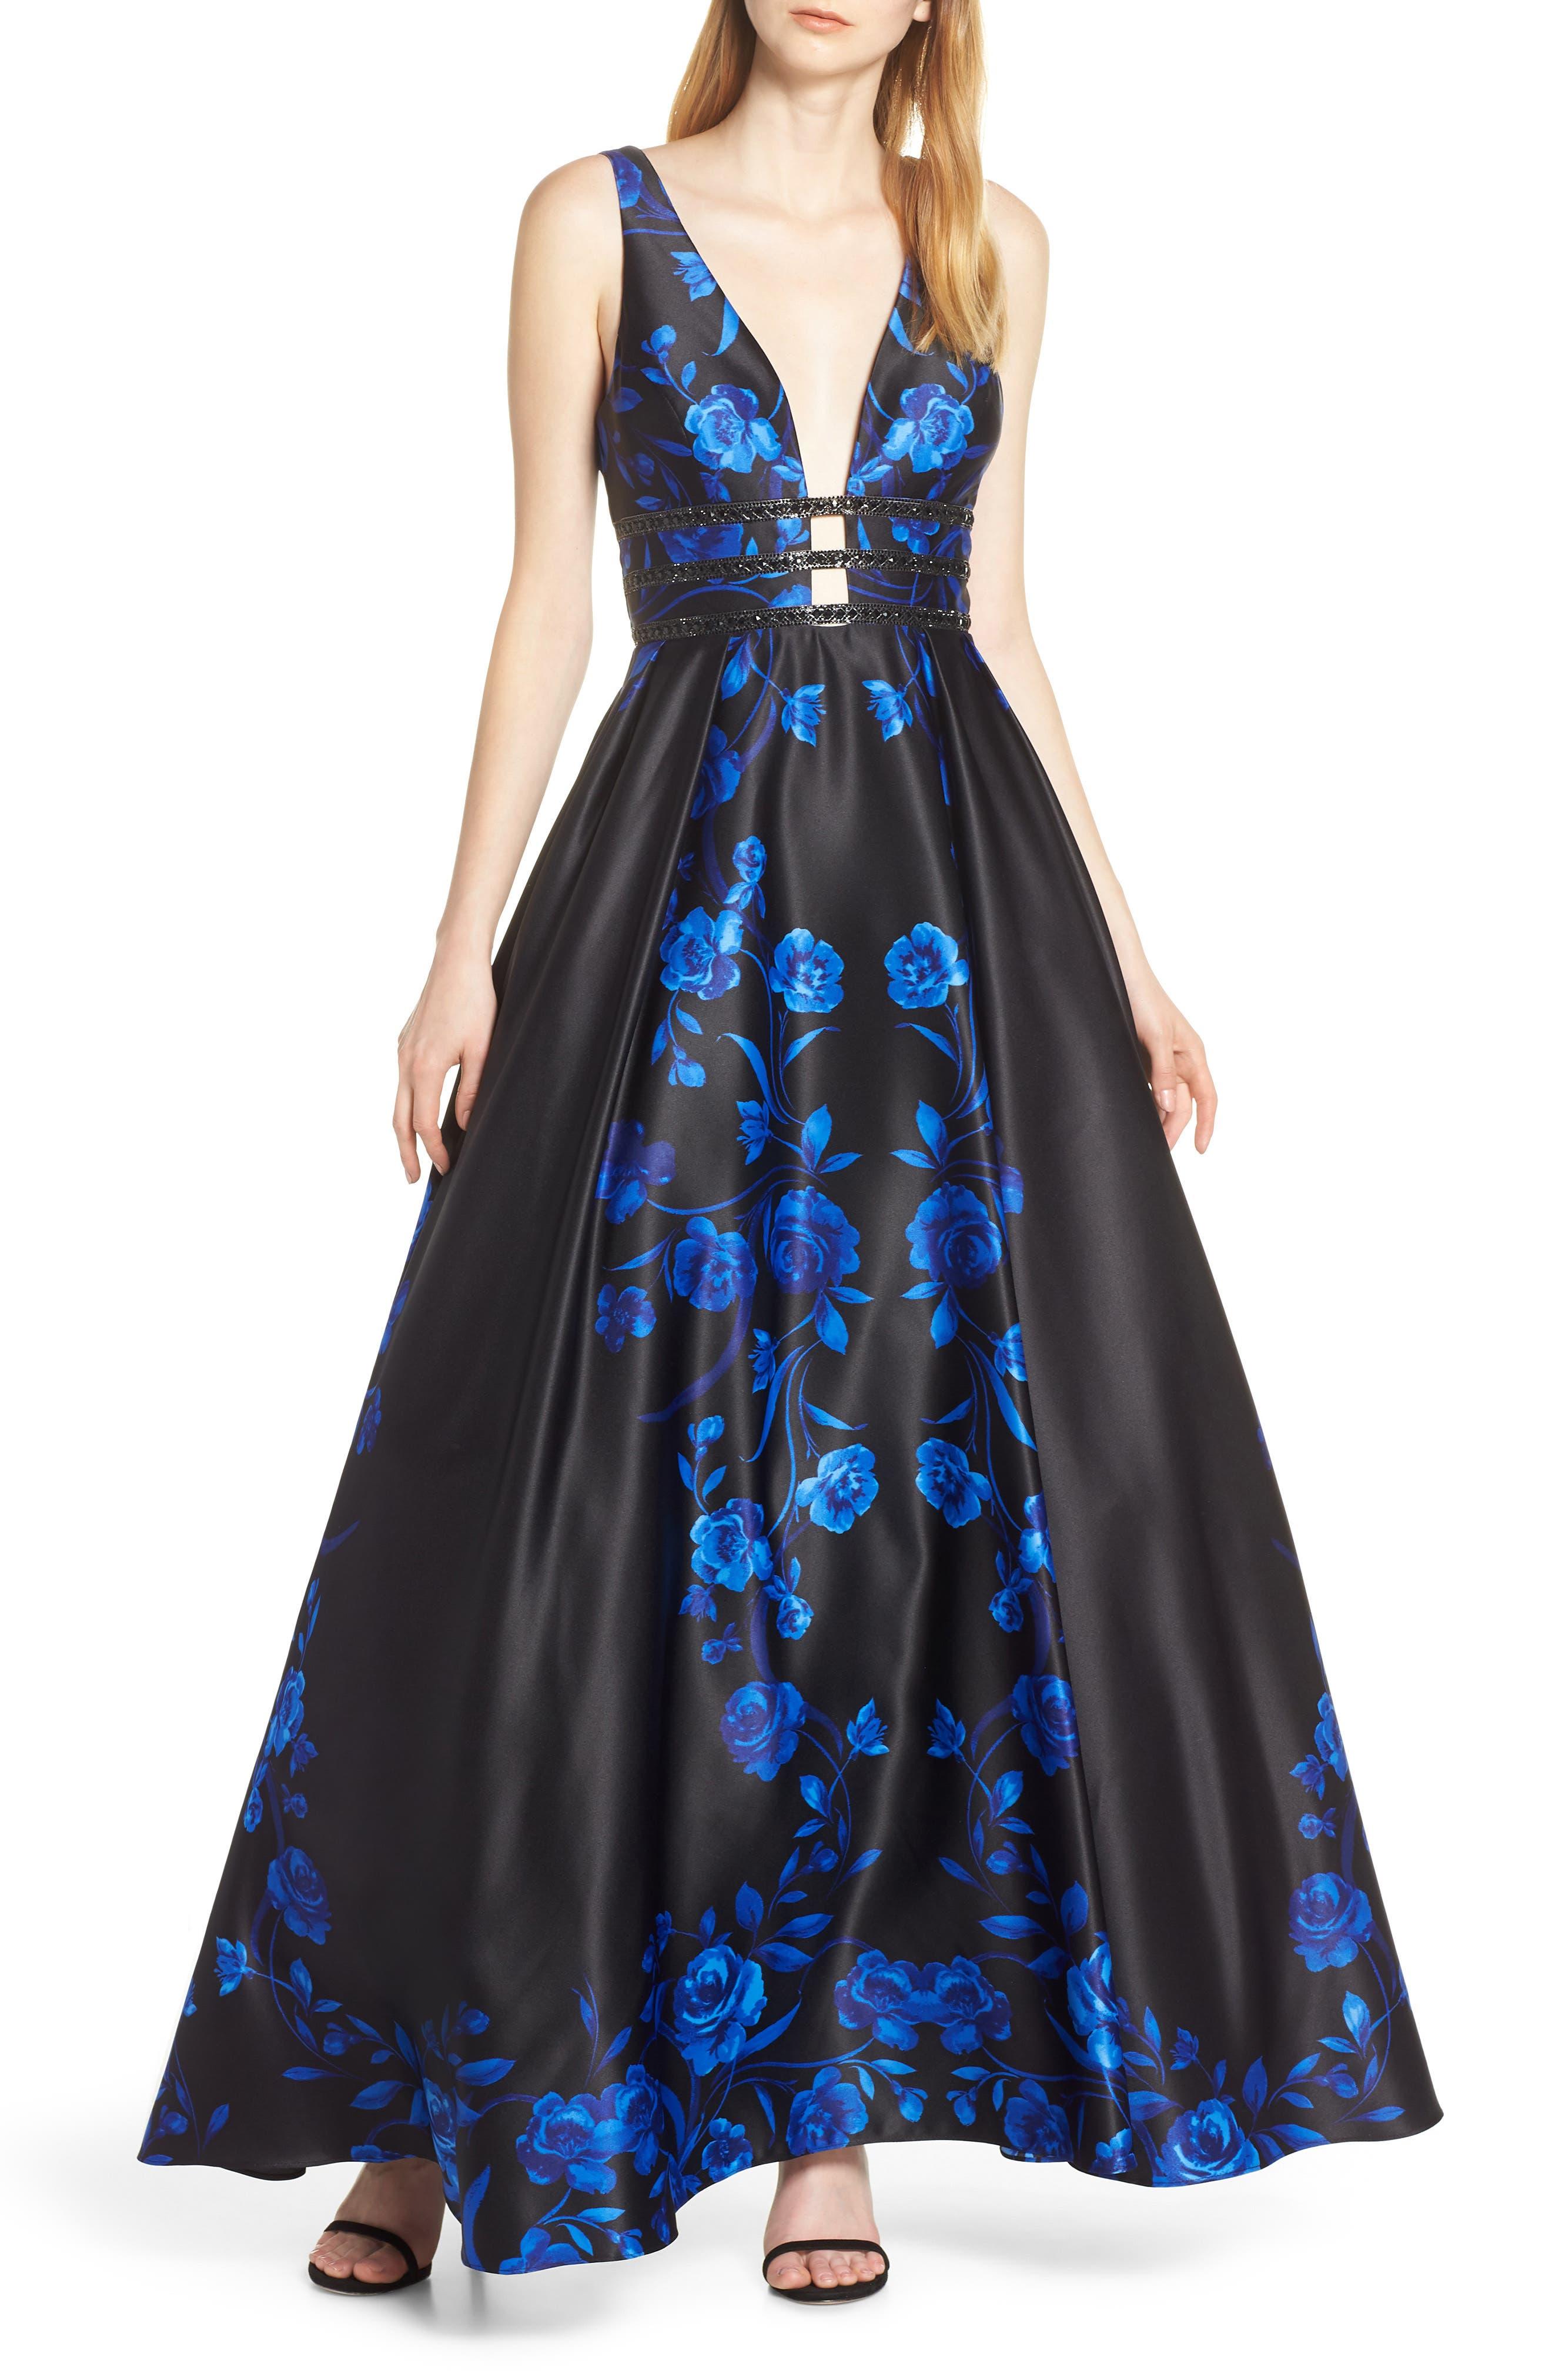 Blondie Nites Triple Band Satin Evening Dress, Blue